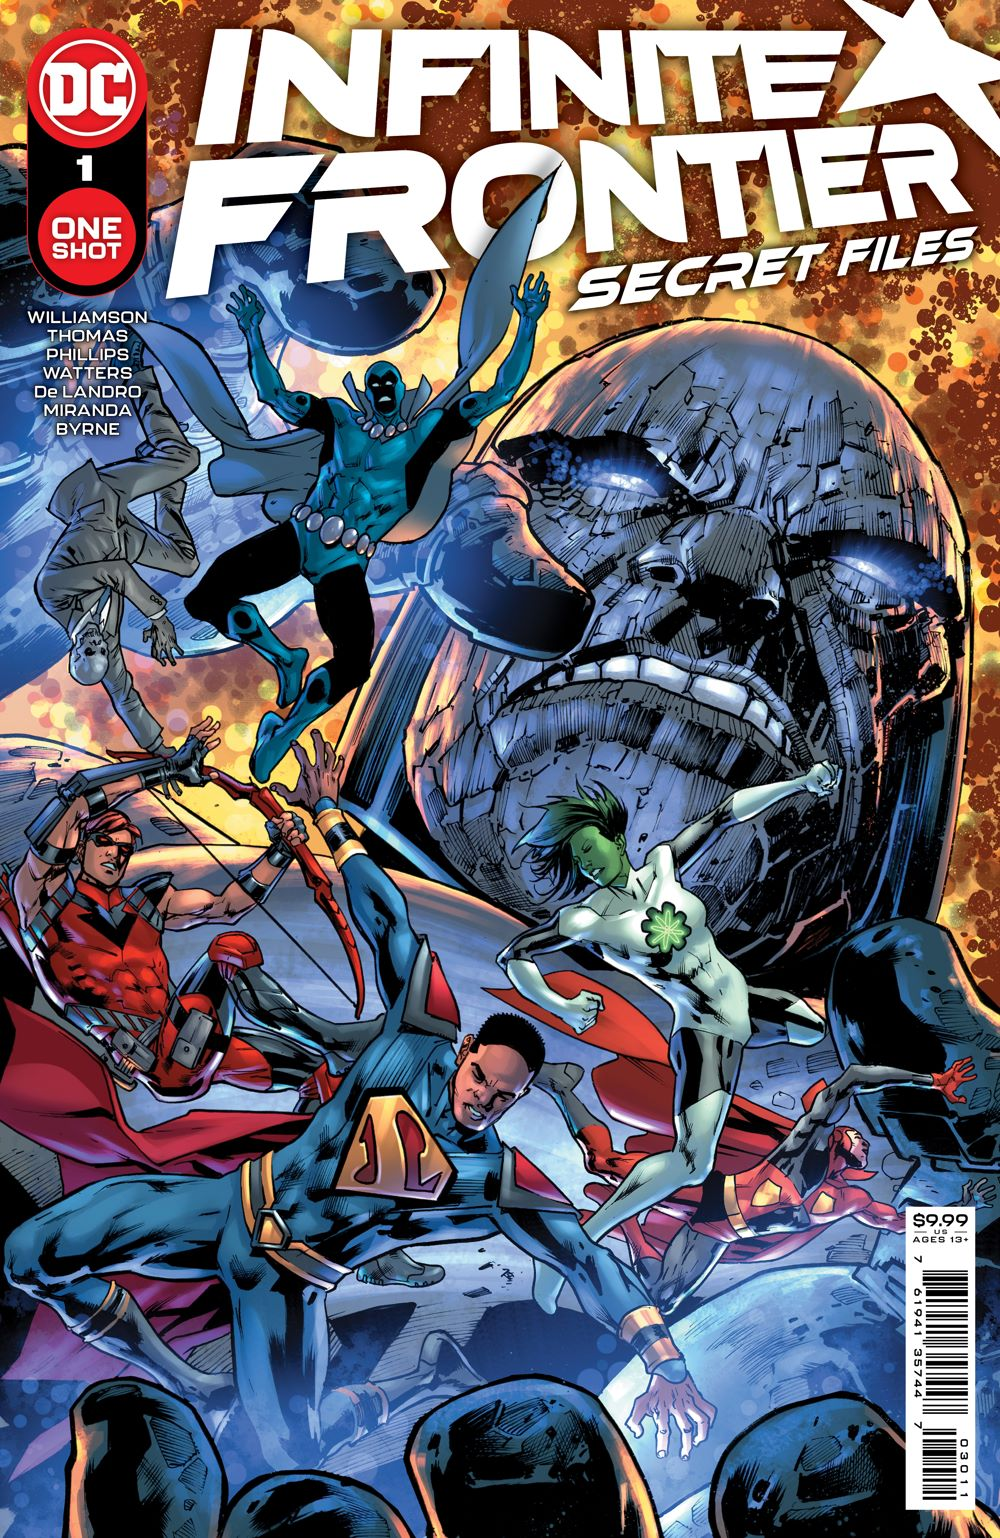 INFINITEFRONTIER_SF_Cv1 DC Comics June 2021 Solicitations